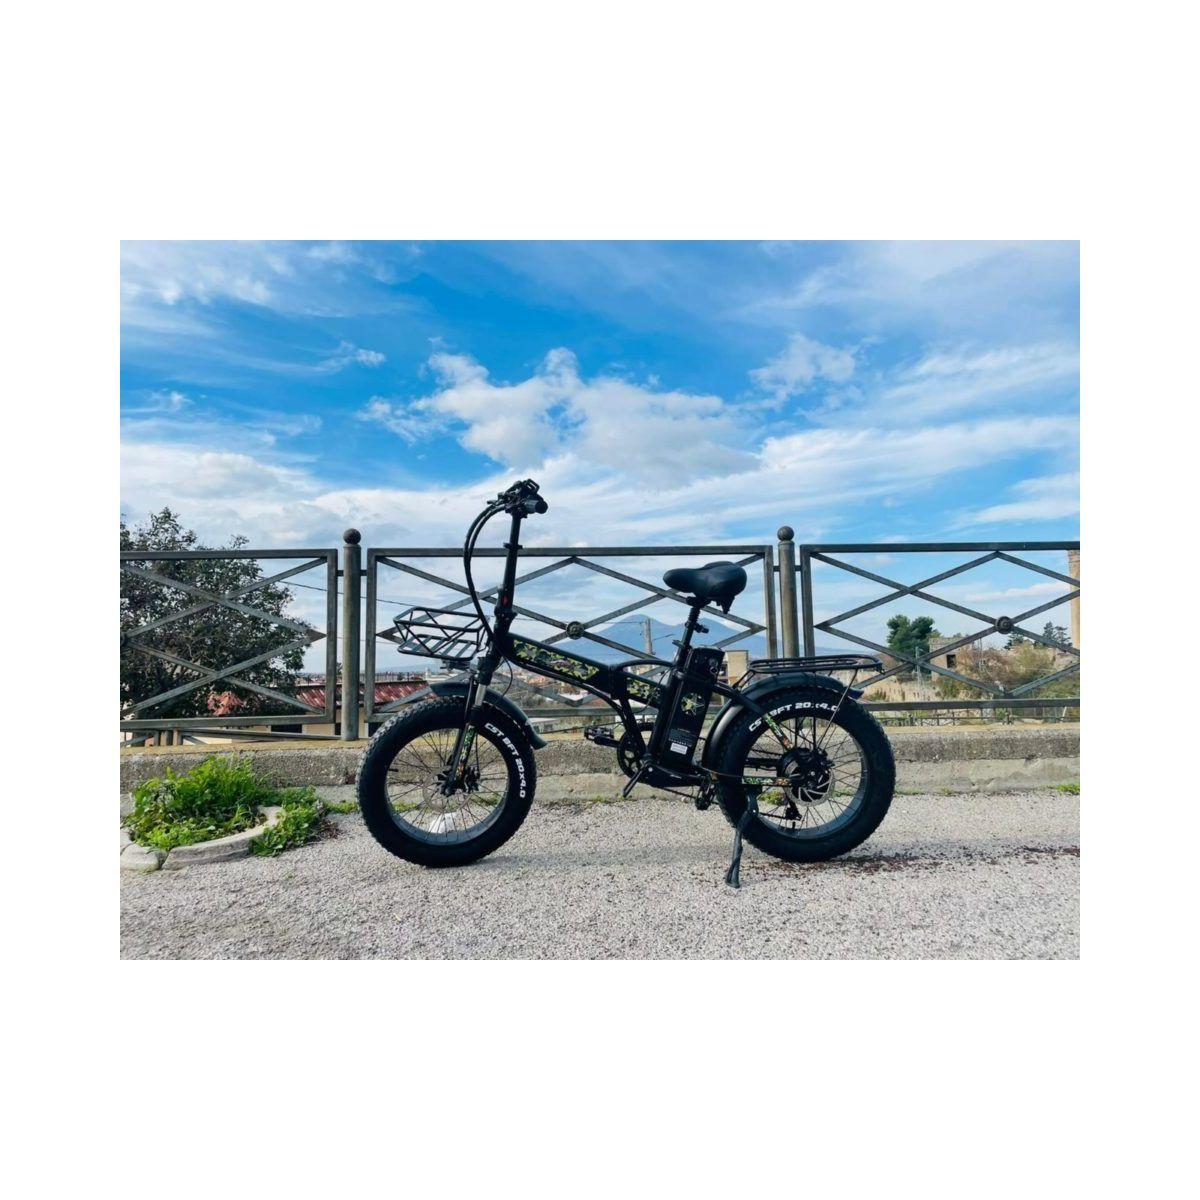 Fat Bike 750w Jeep Class Militar E-Bike 20′ Bicicletta Bici pieghevole elettrica 48V Nero opaco